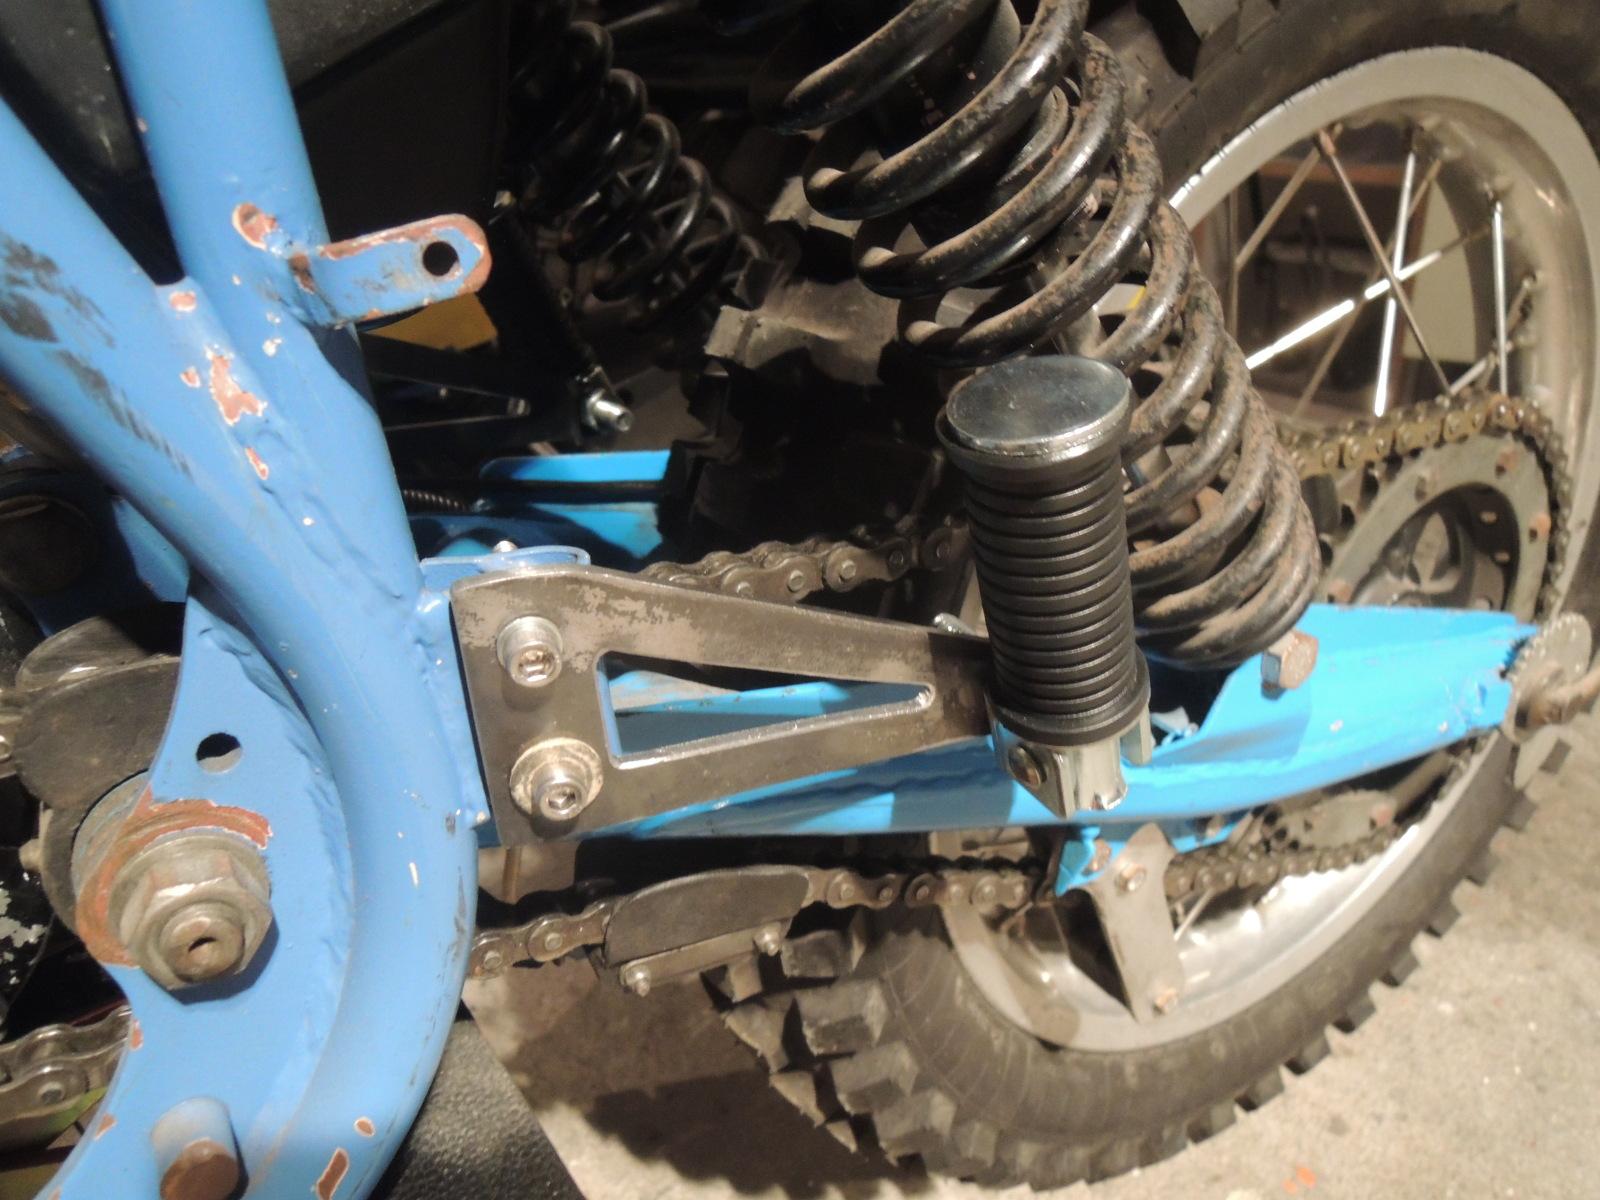 Bultaco Frontera MK11 370 - By Jorok - Página 2 2ephtdz